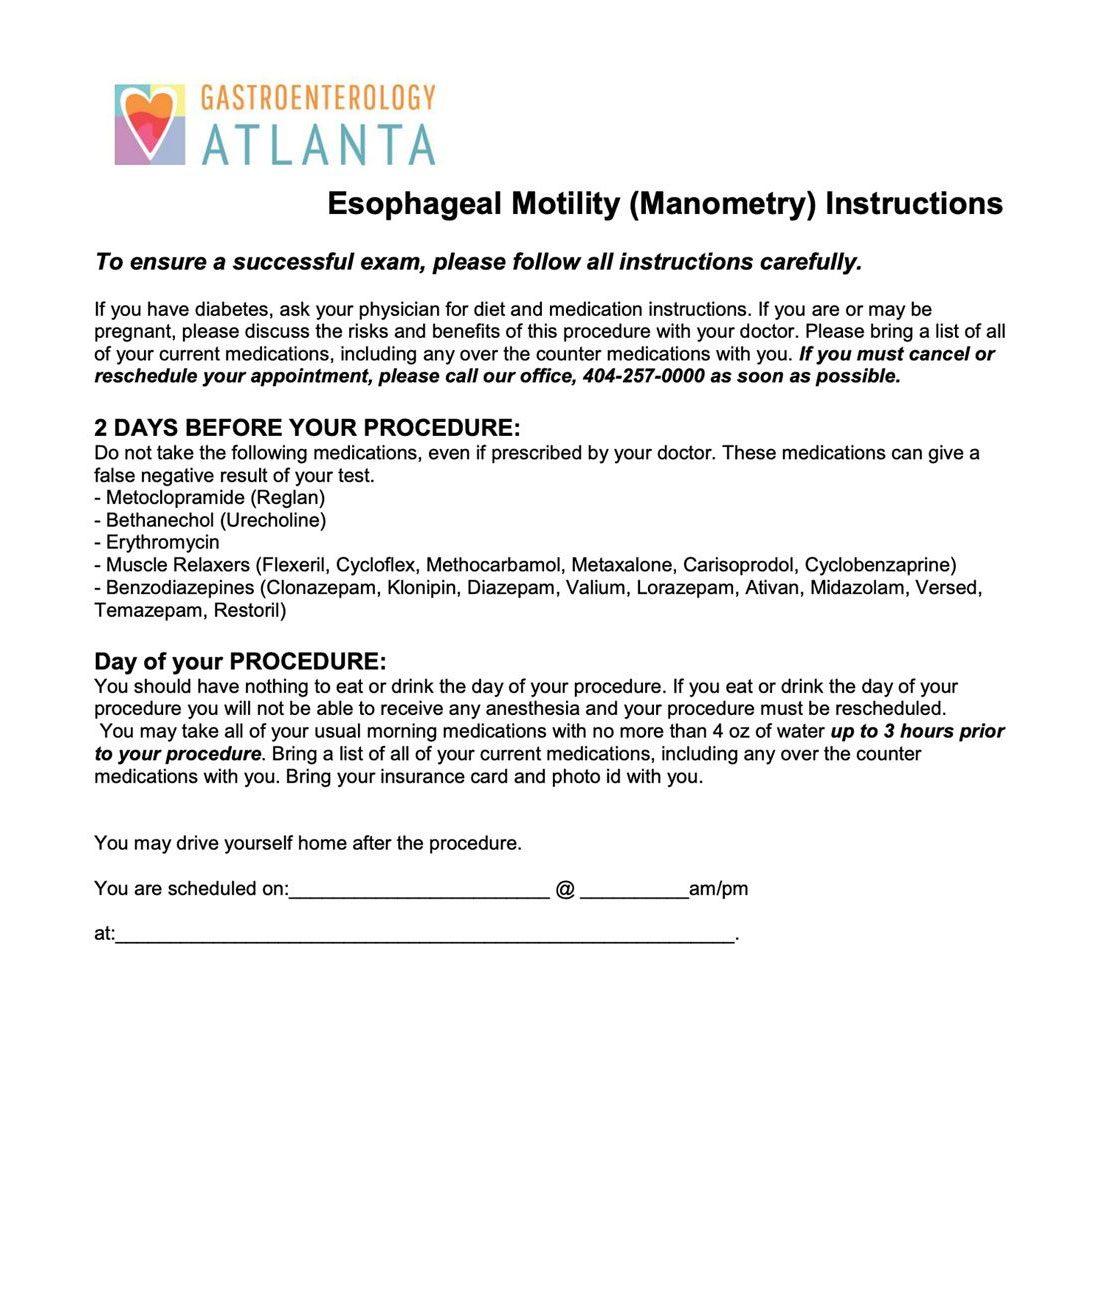 Esophageal Motility (Manometry) Instructions